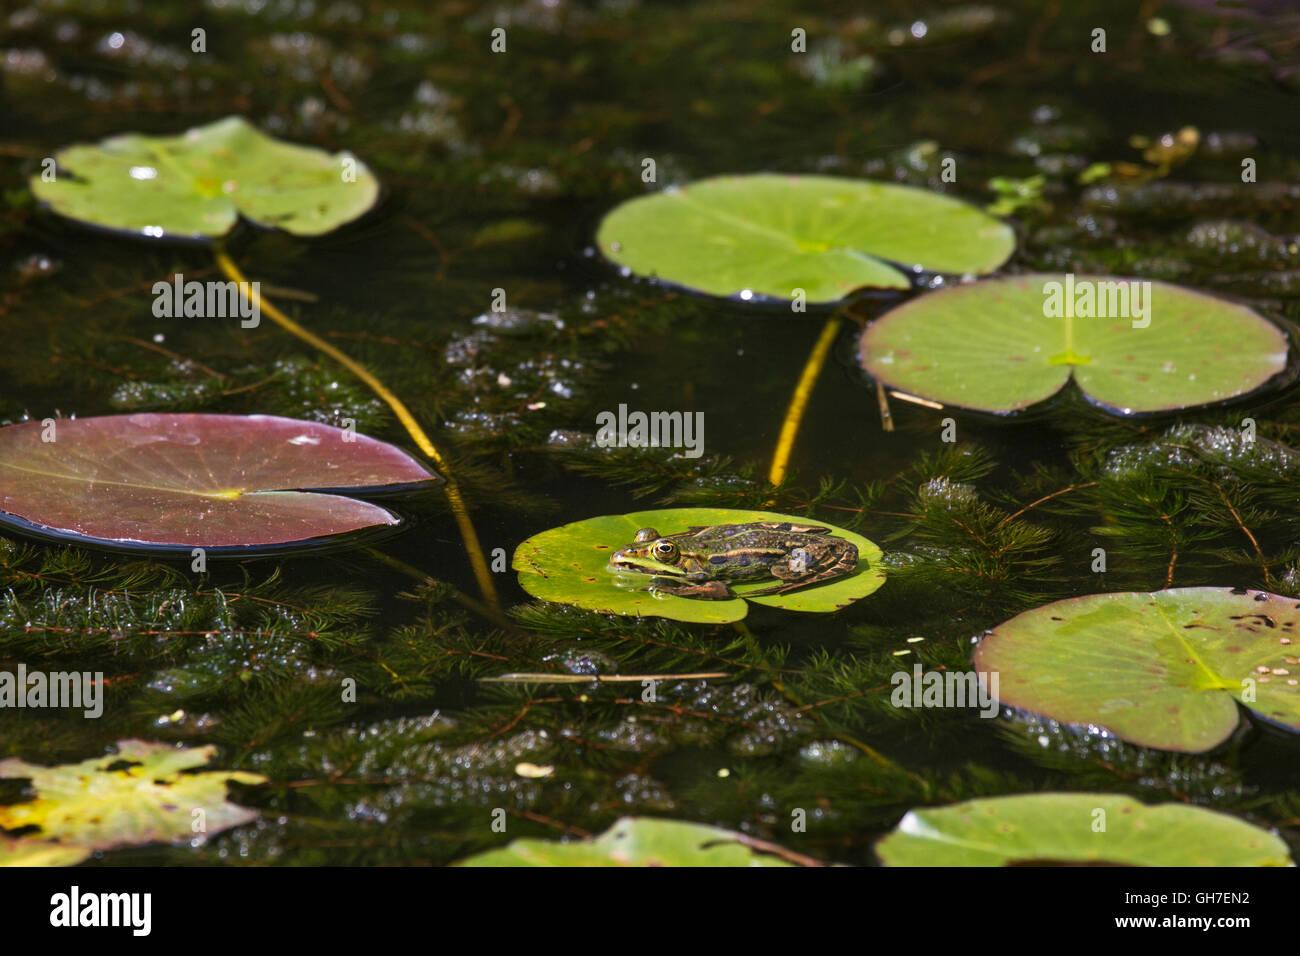 Edible frog / green frog (Pelophylax kl. esculentus / Rana kl. esculenta) sitting on floating leaf of waterlily - Stock Image